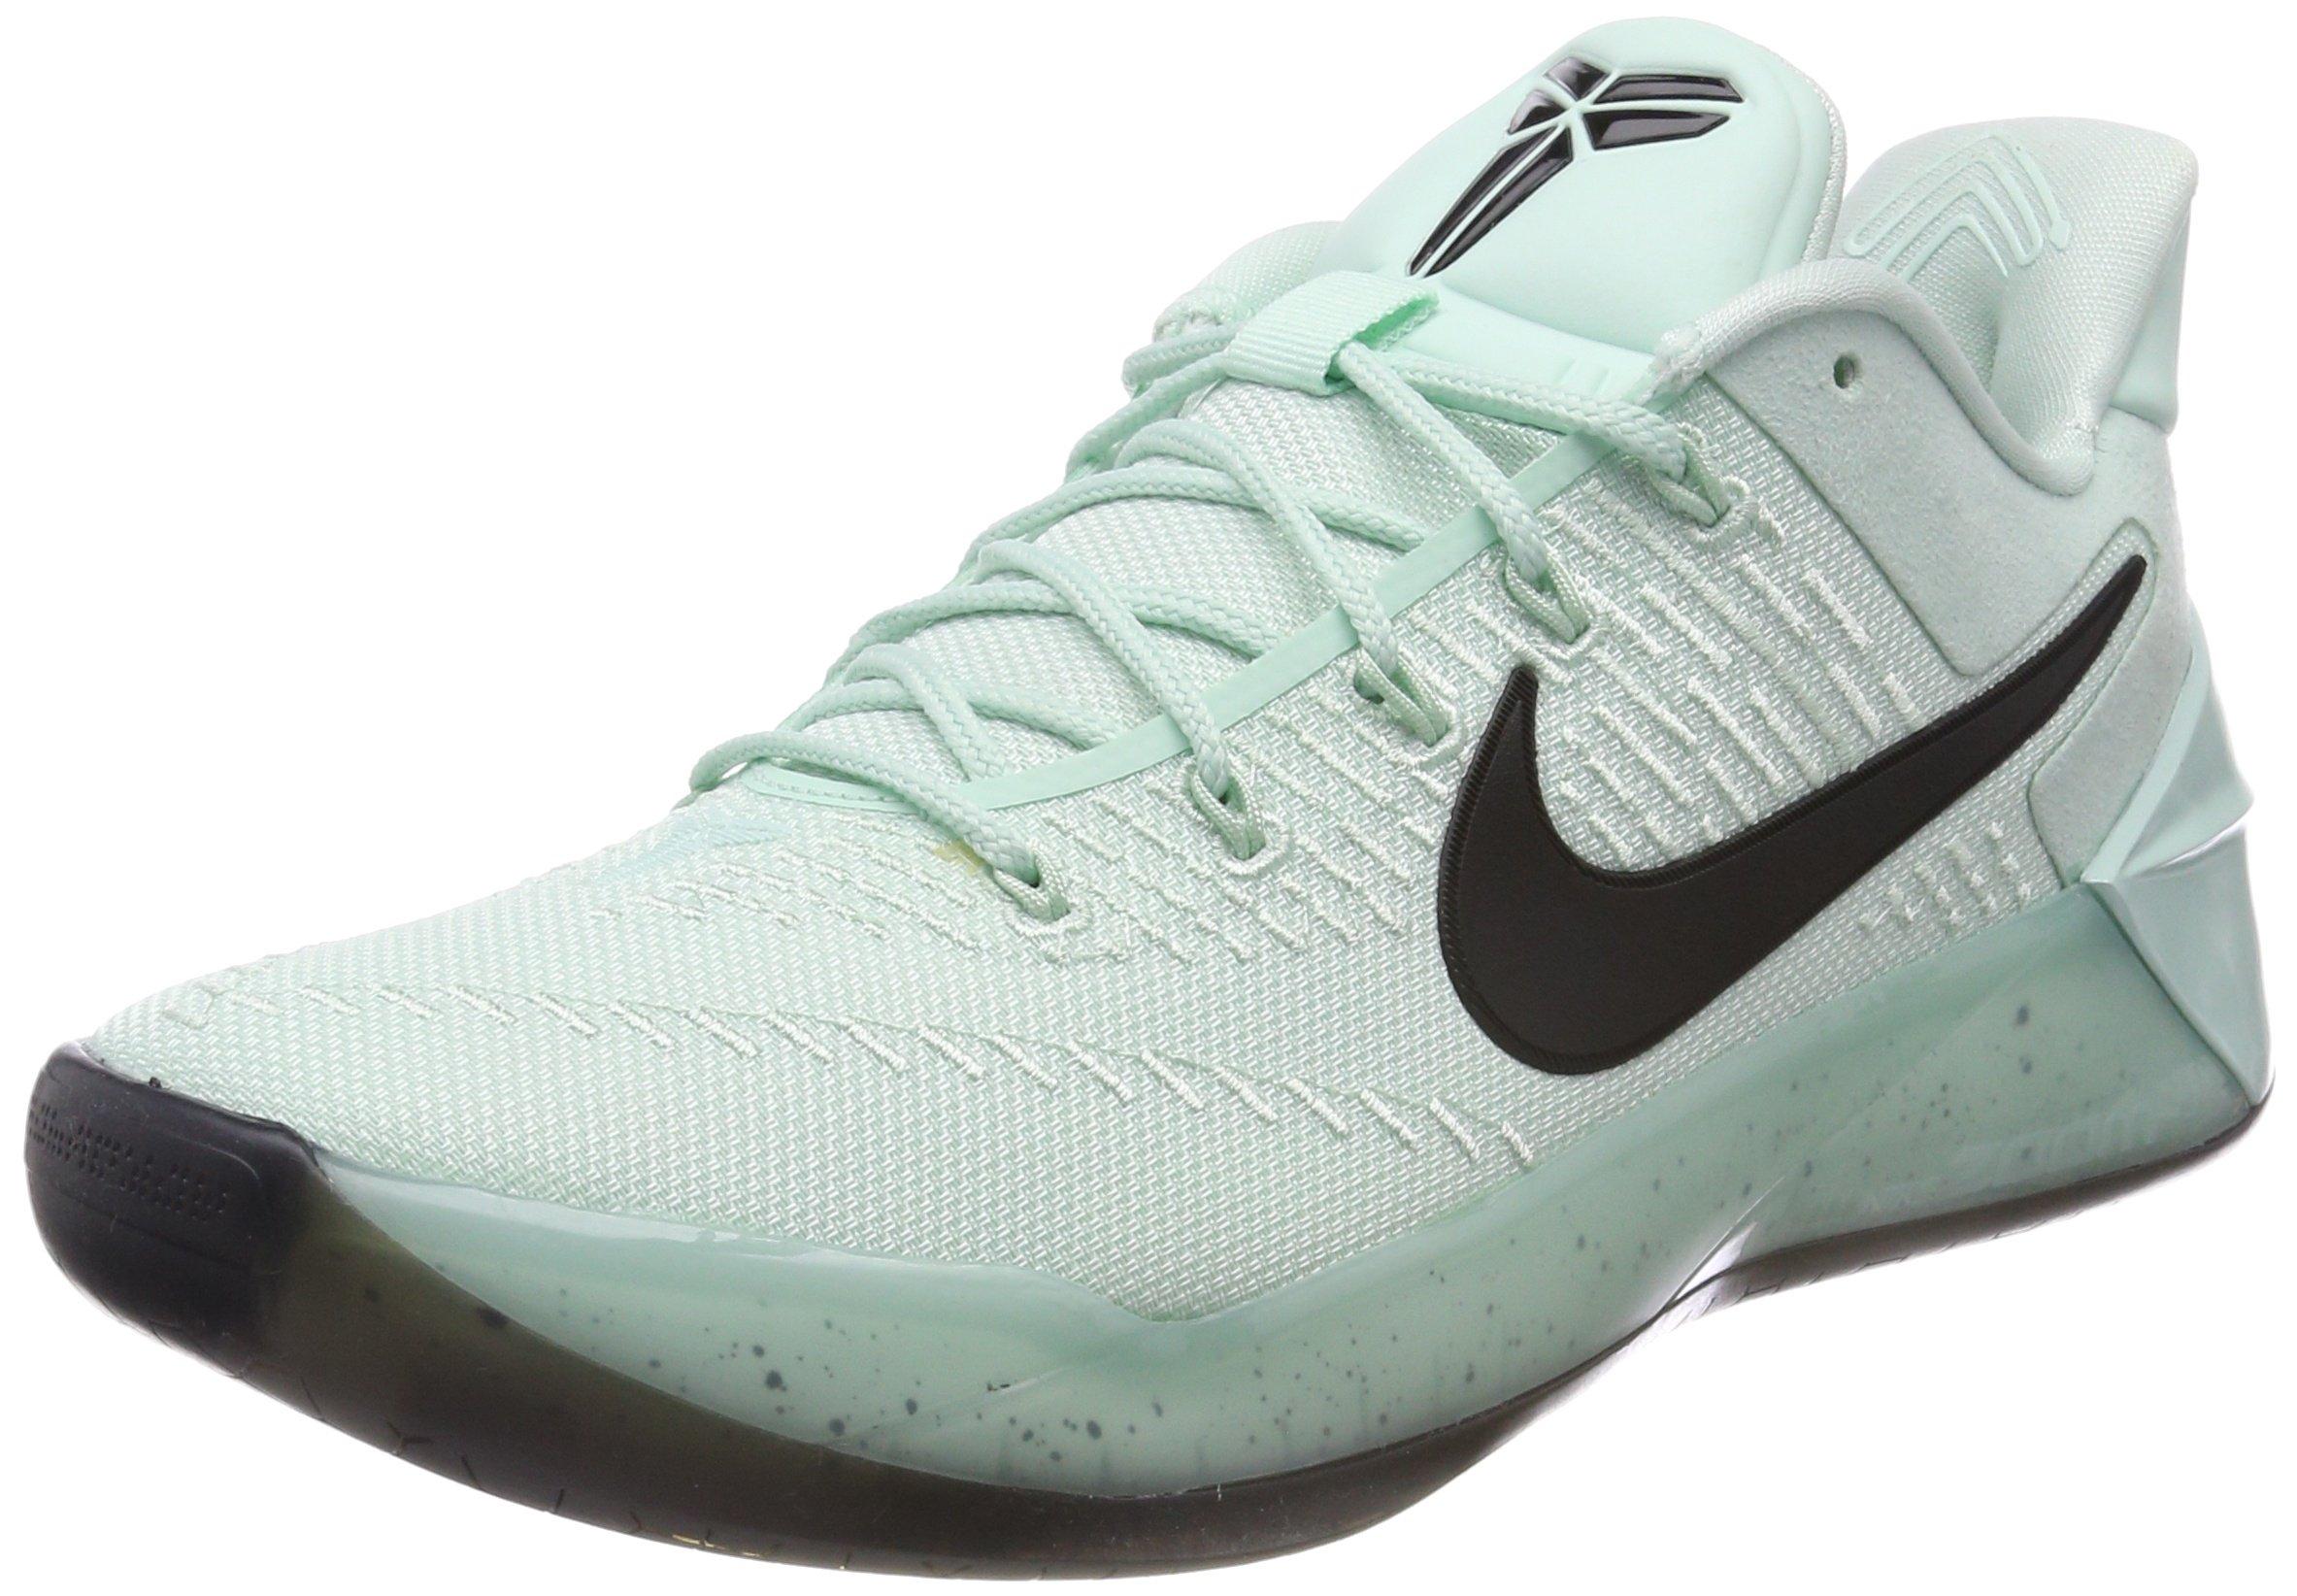 designer fashion 7a26f fa8a3 Galleon - Nike Kobe A.D. Men's Basketball Shoes Igloo/Black ...